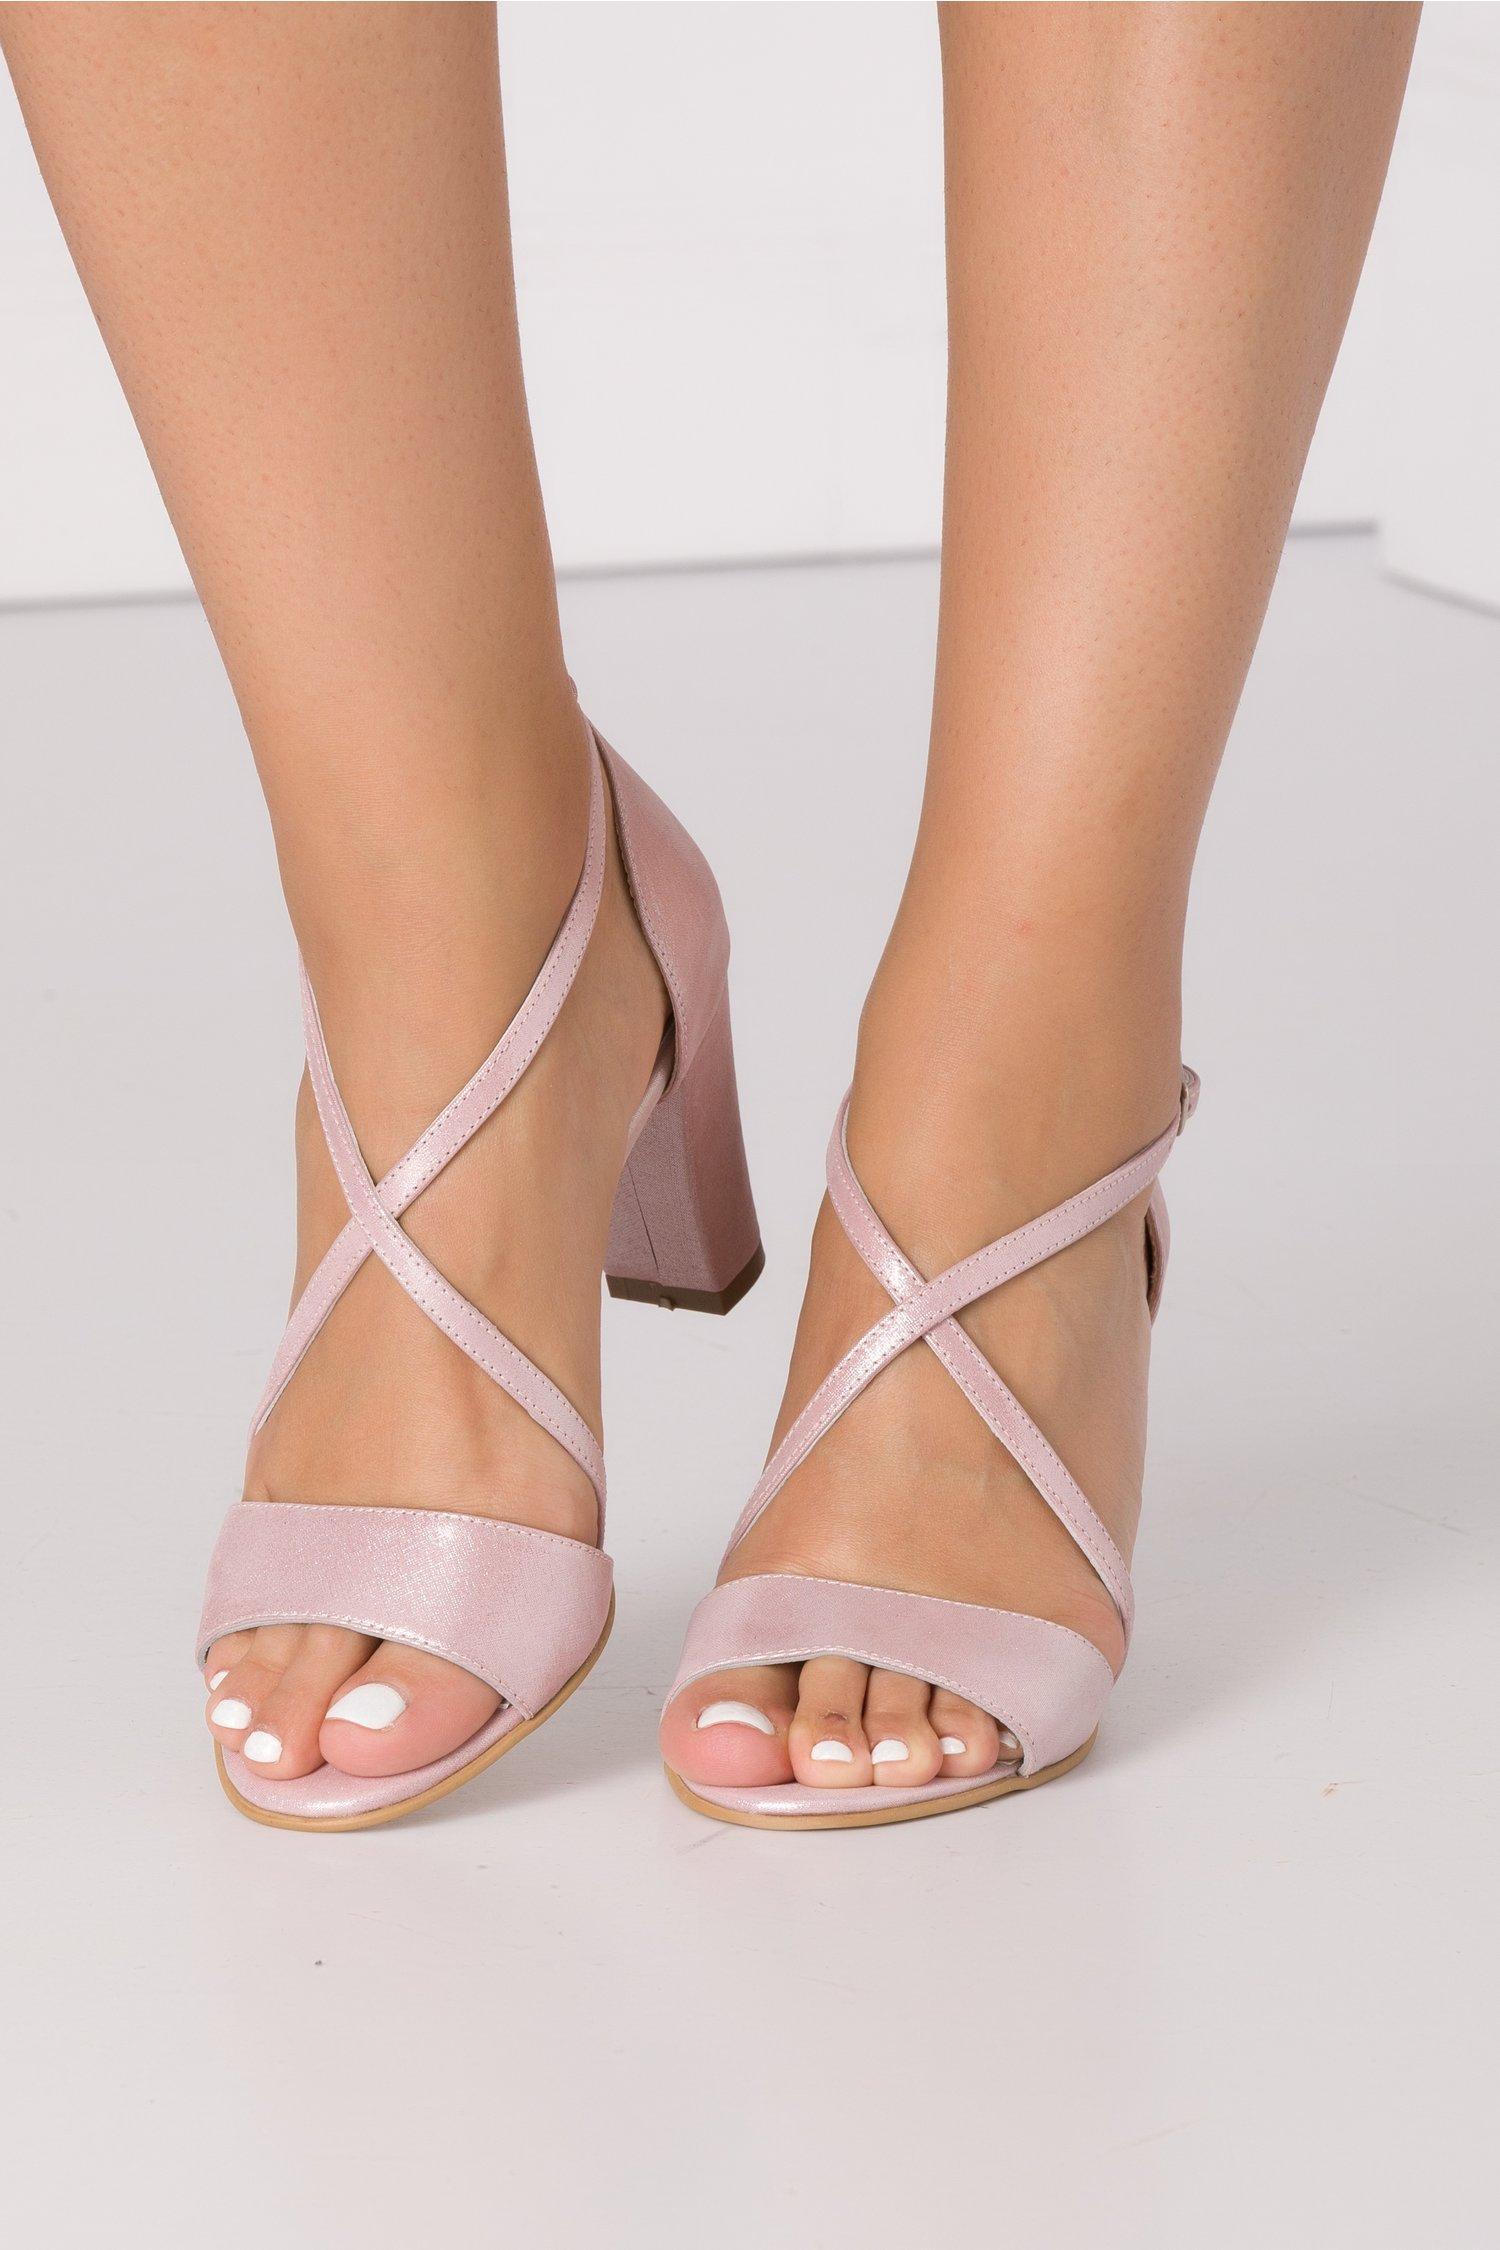 Sandale elegante roz sidefat